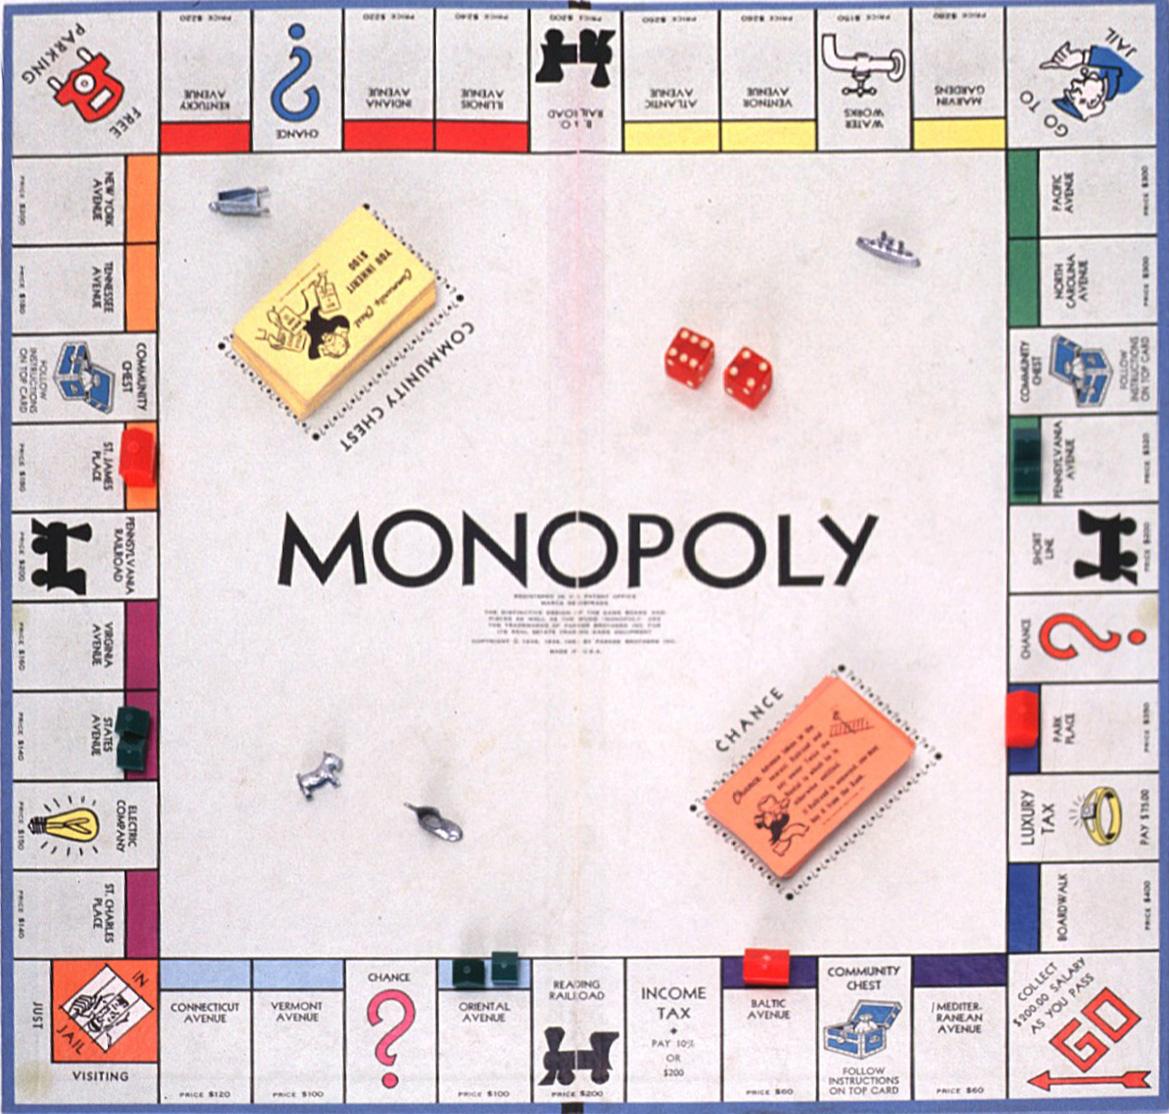 http://3.bp.blogspot.com/_SbGSSRU5LeE/THXbmVMKOOI/AAAAAAAAD6o/X0KQLQtFAV0/s1600/monopoly%25252Bgame%25252Bimage.jpg